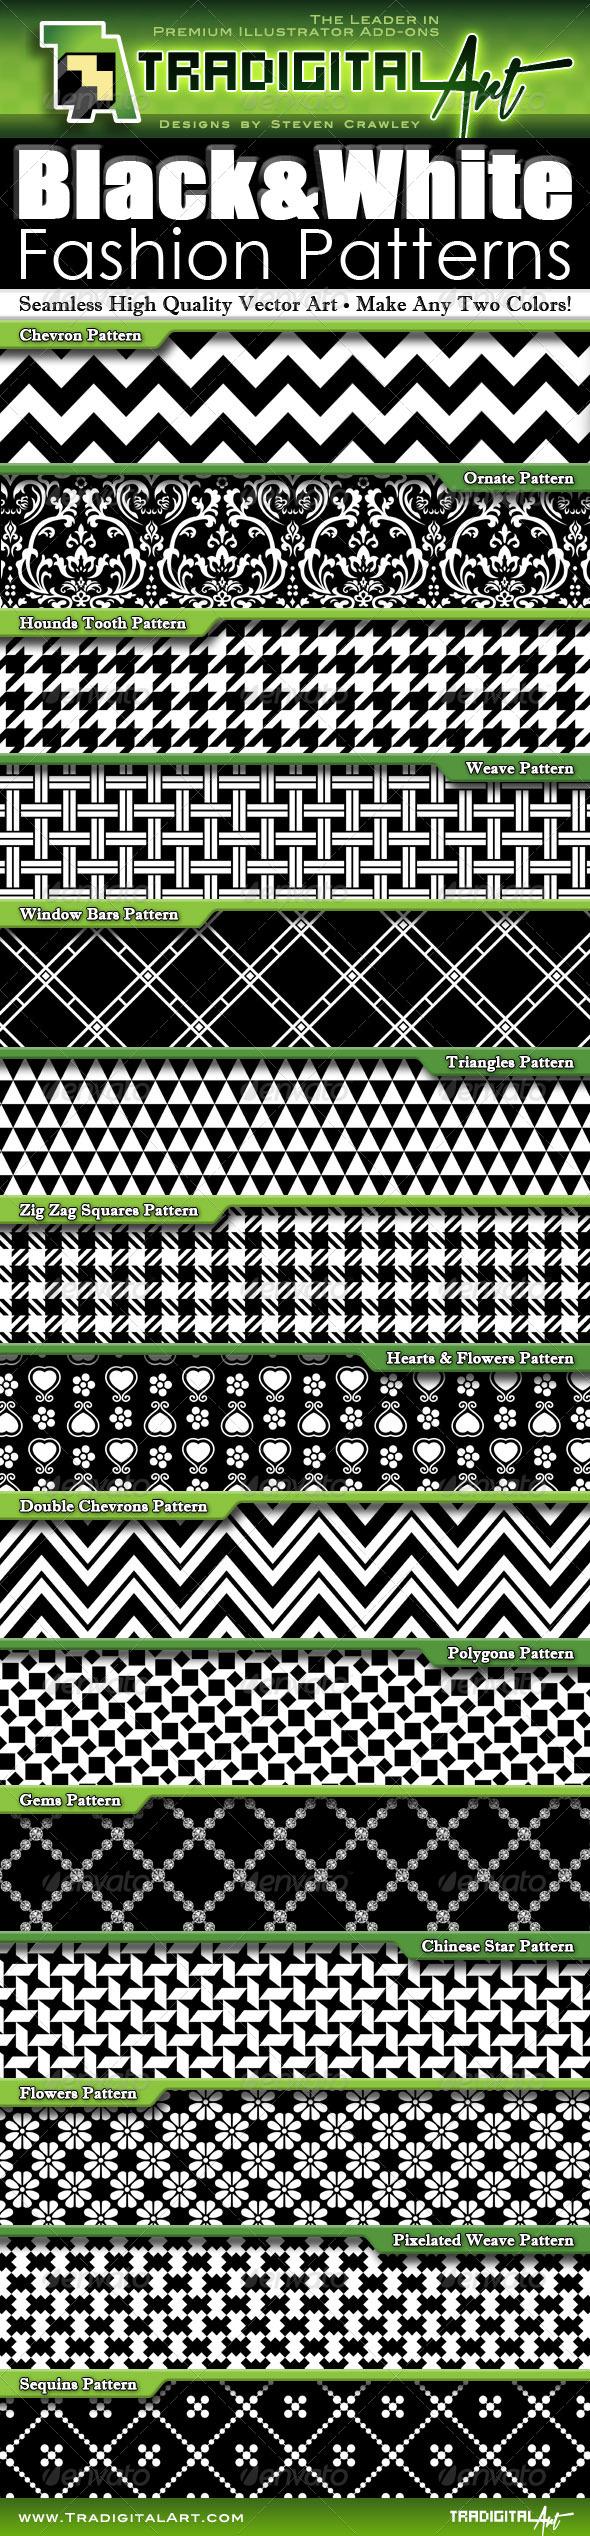 GraphicRiver Black & White Fashion Patterns 6864594